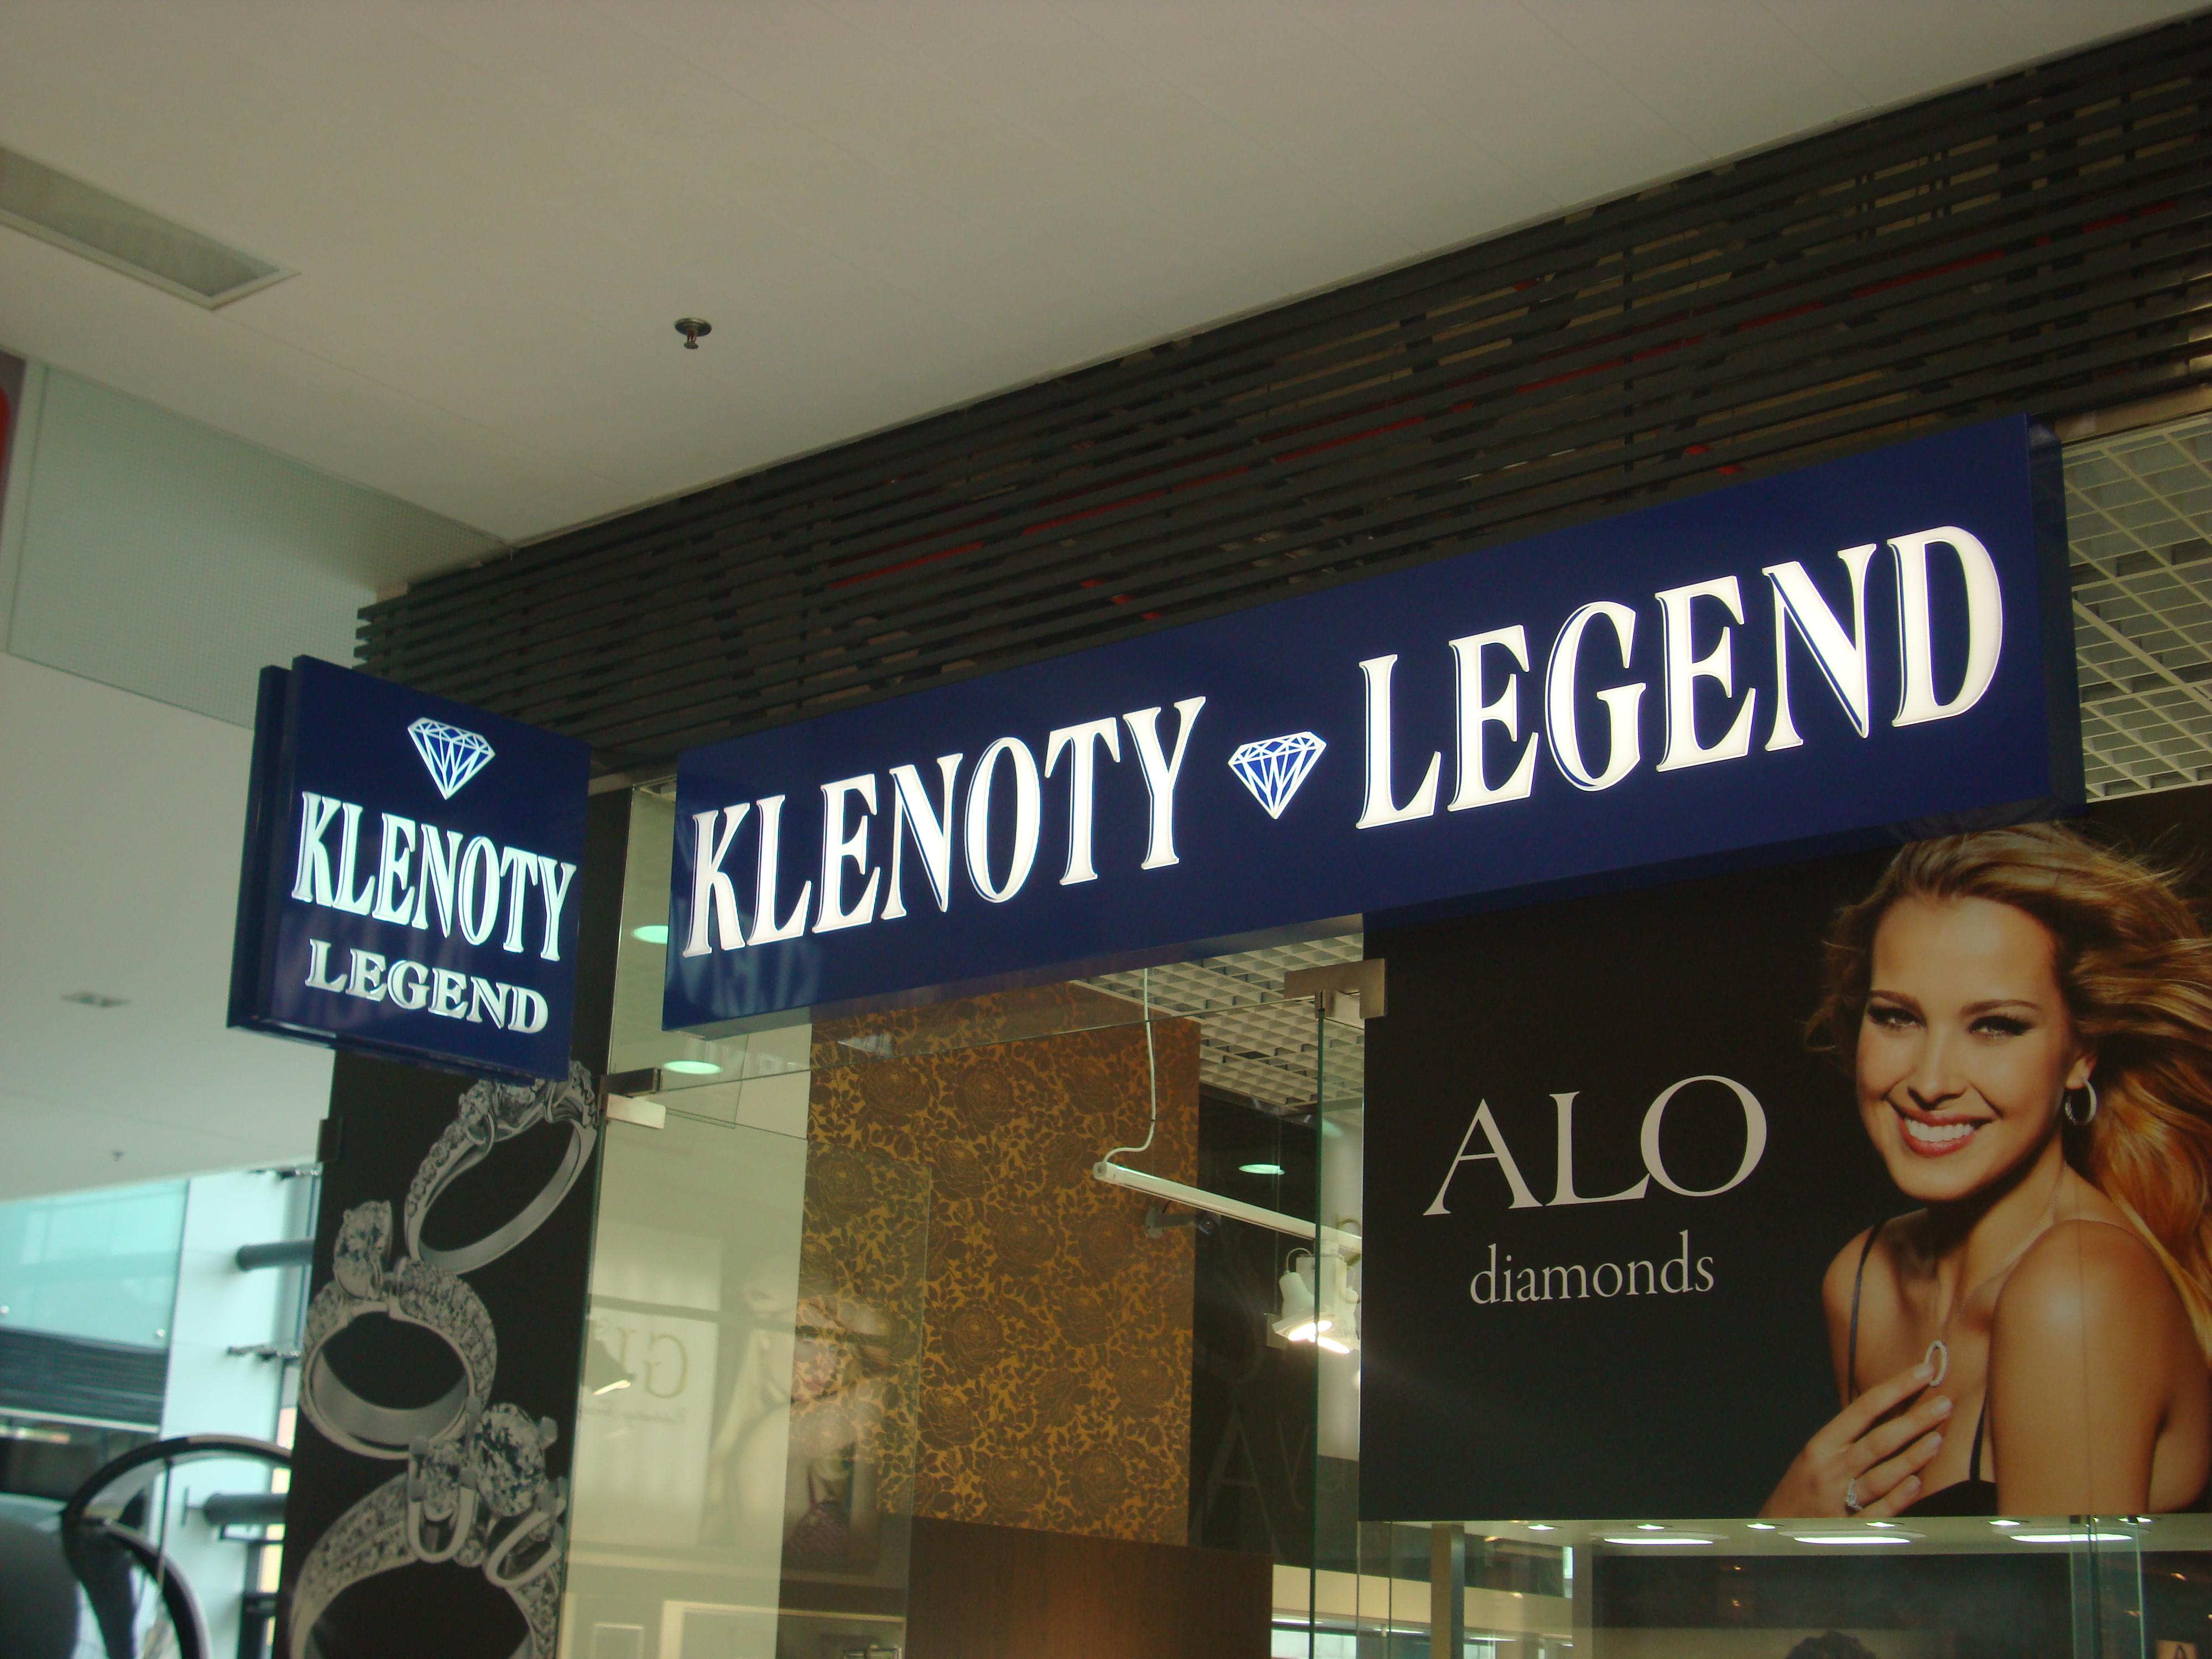 KLENOTY LEGEND